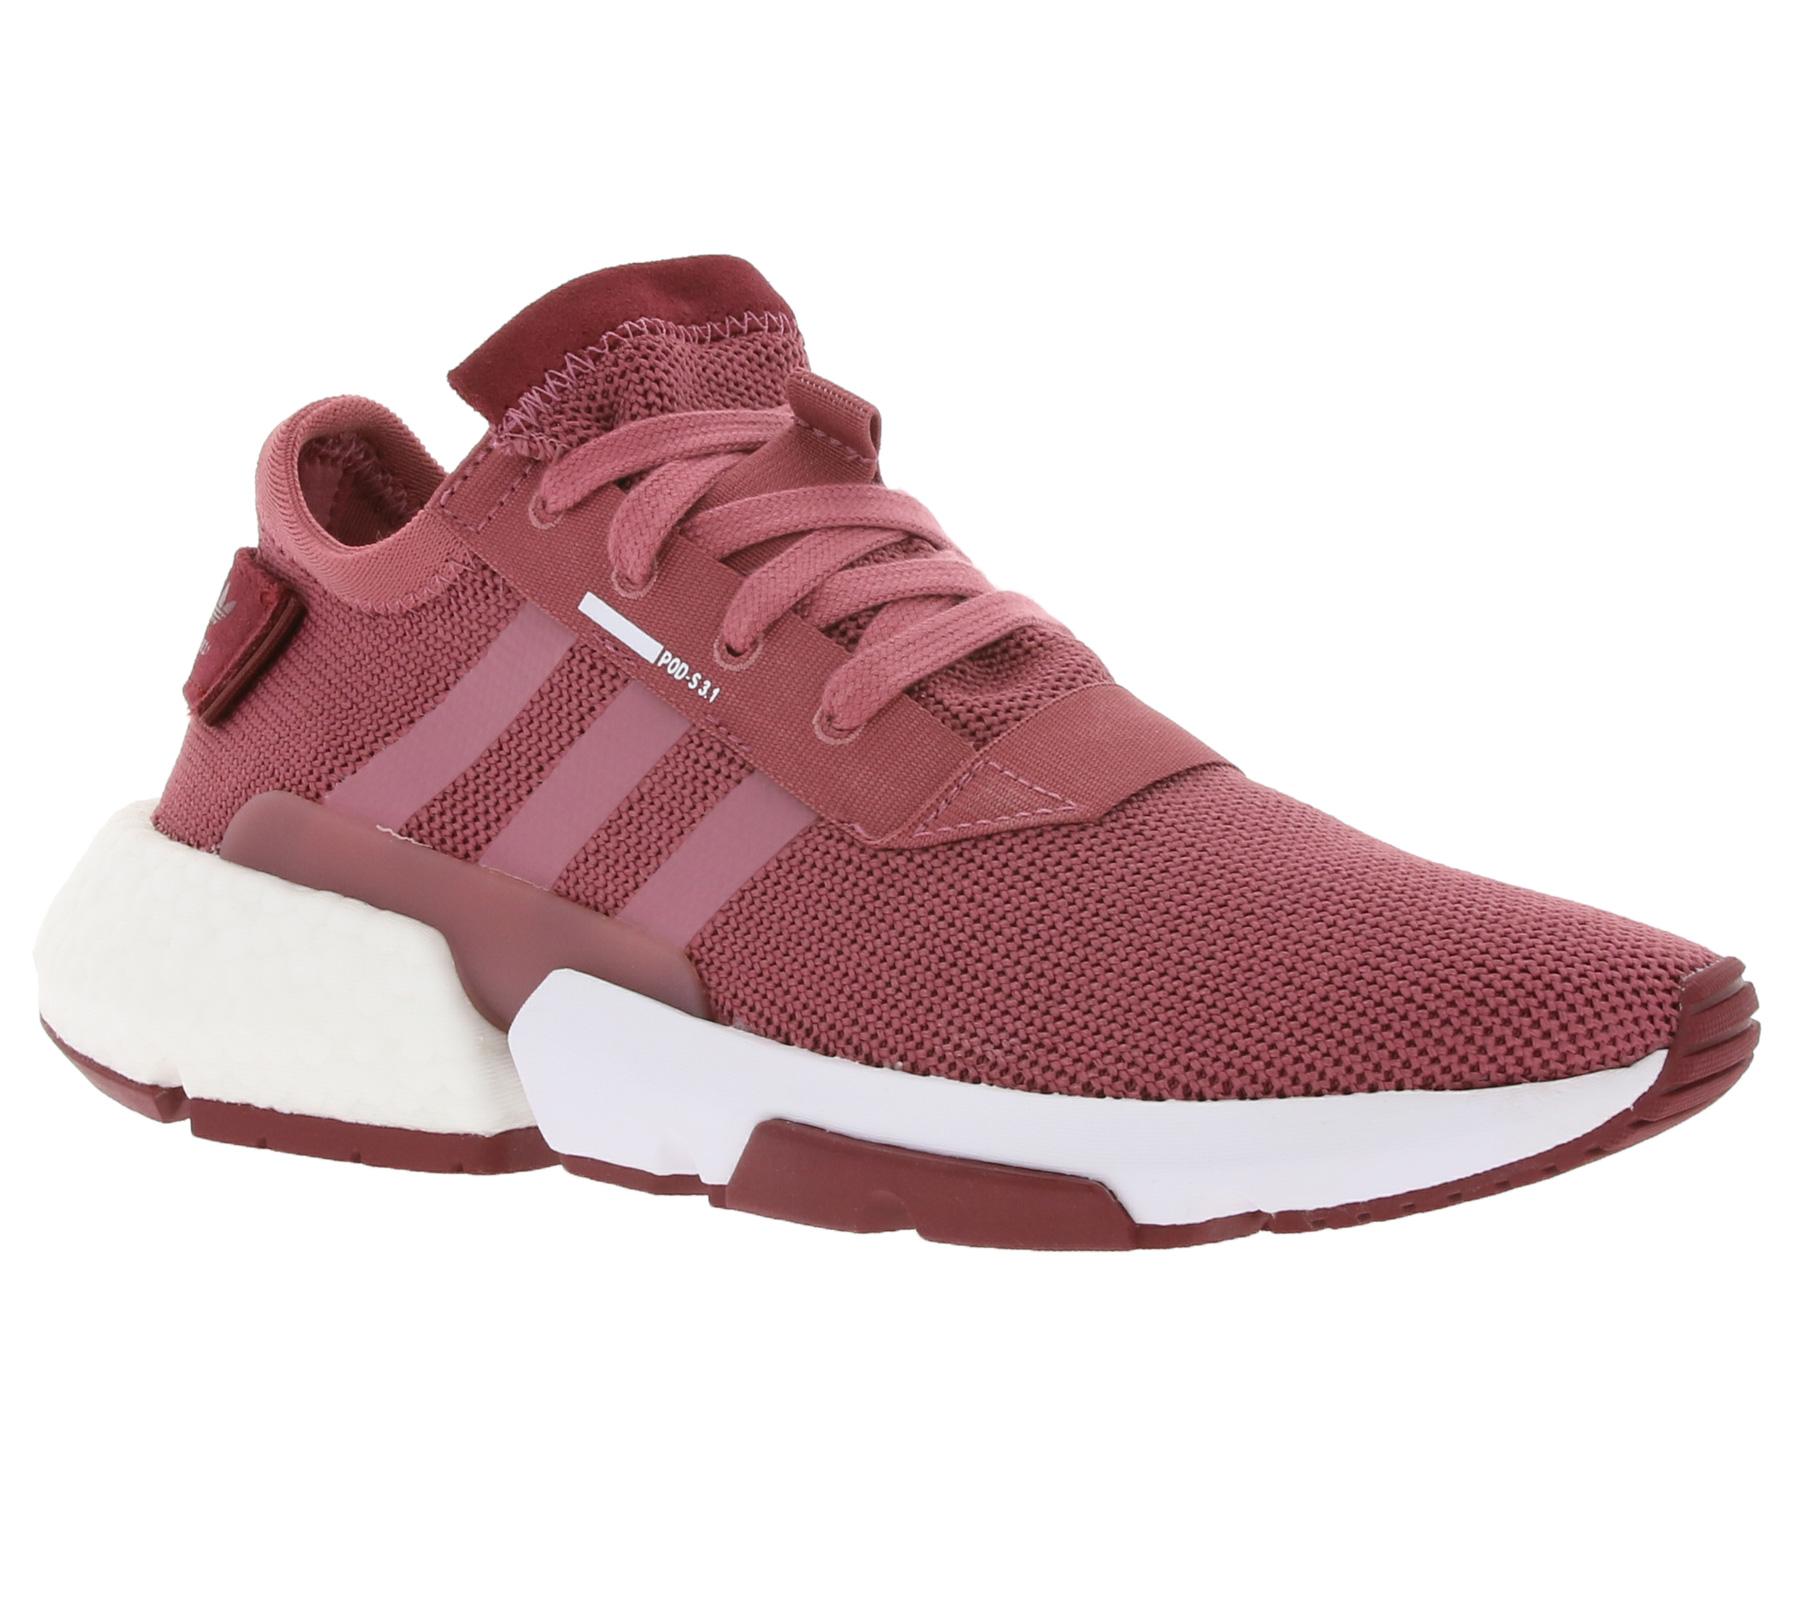 adidas Originals Sneaker sportliche Damen Schuhe POD S3.1 W Bordeaux | B2B